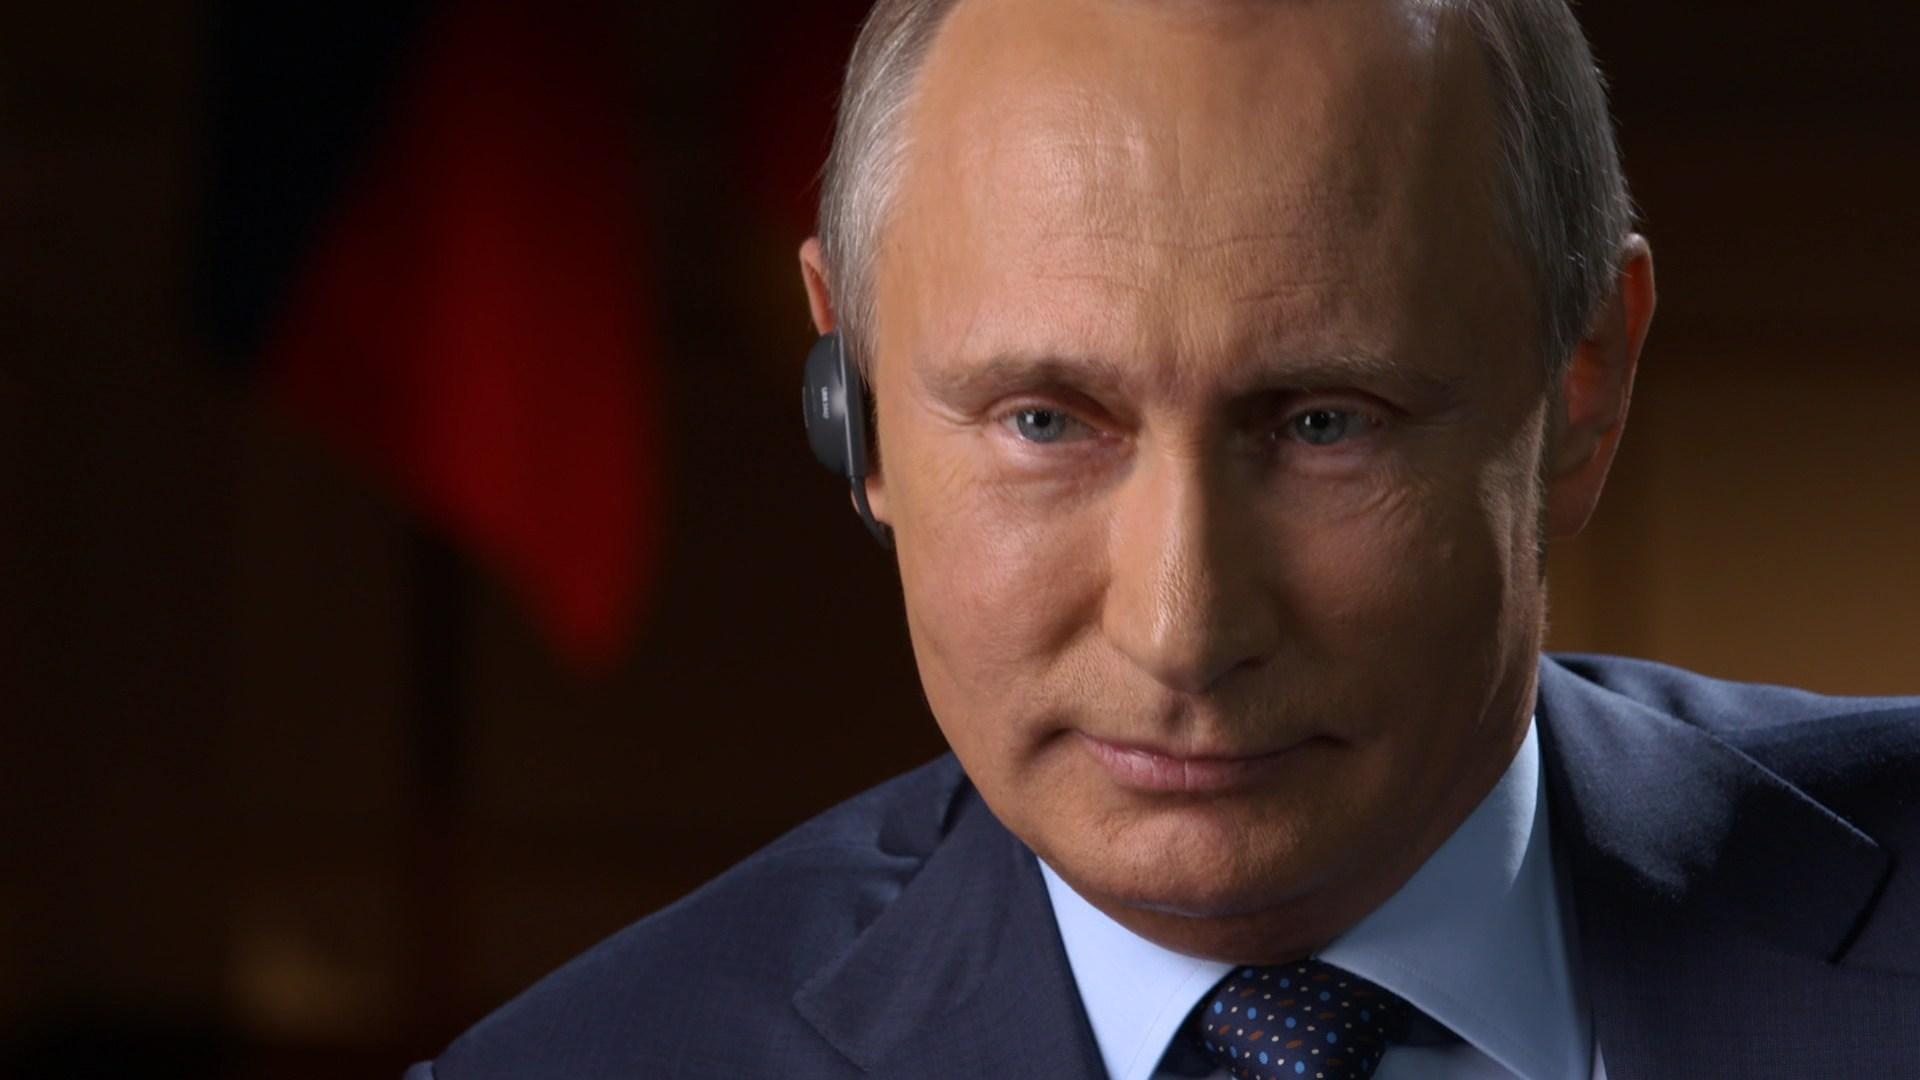 Vladimir Putin. (CBS News photo)